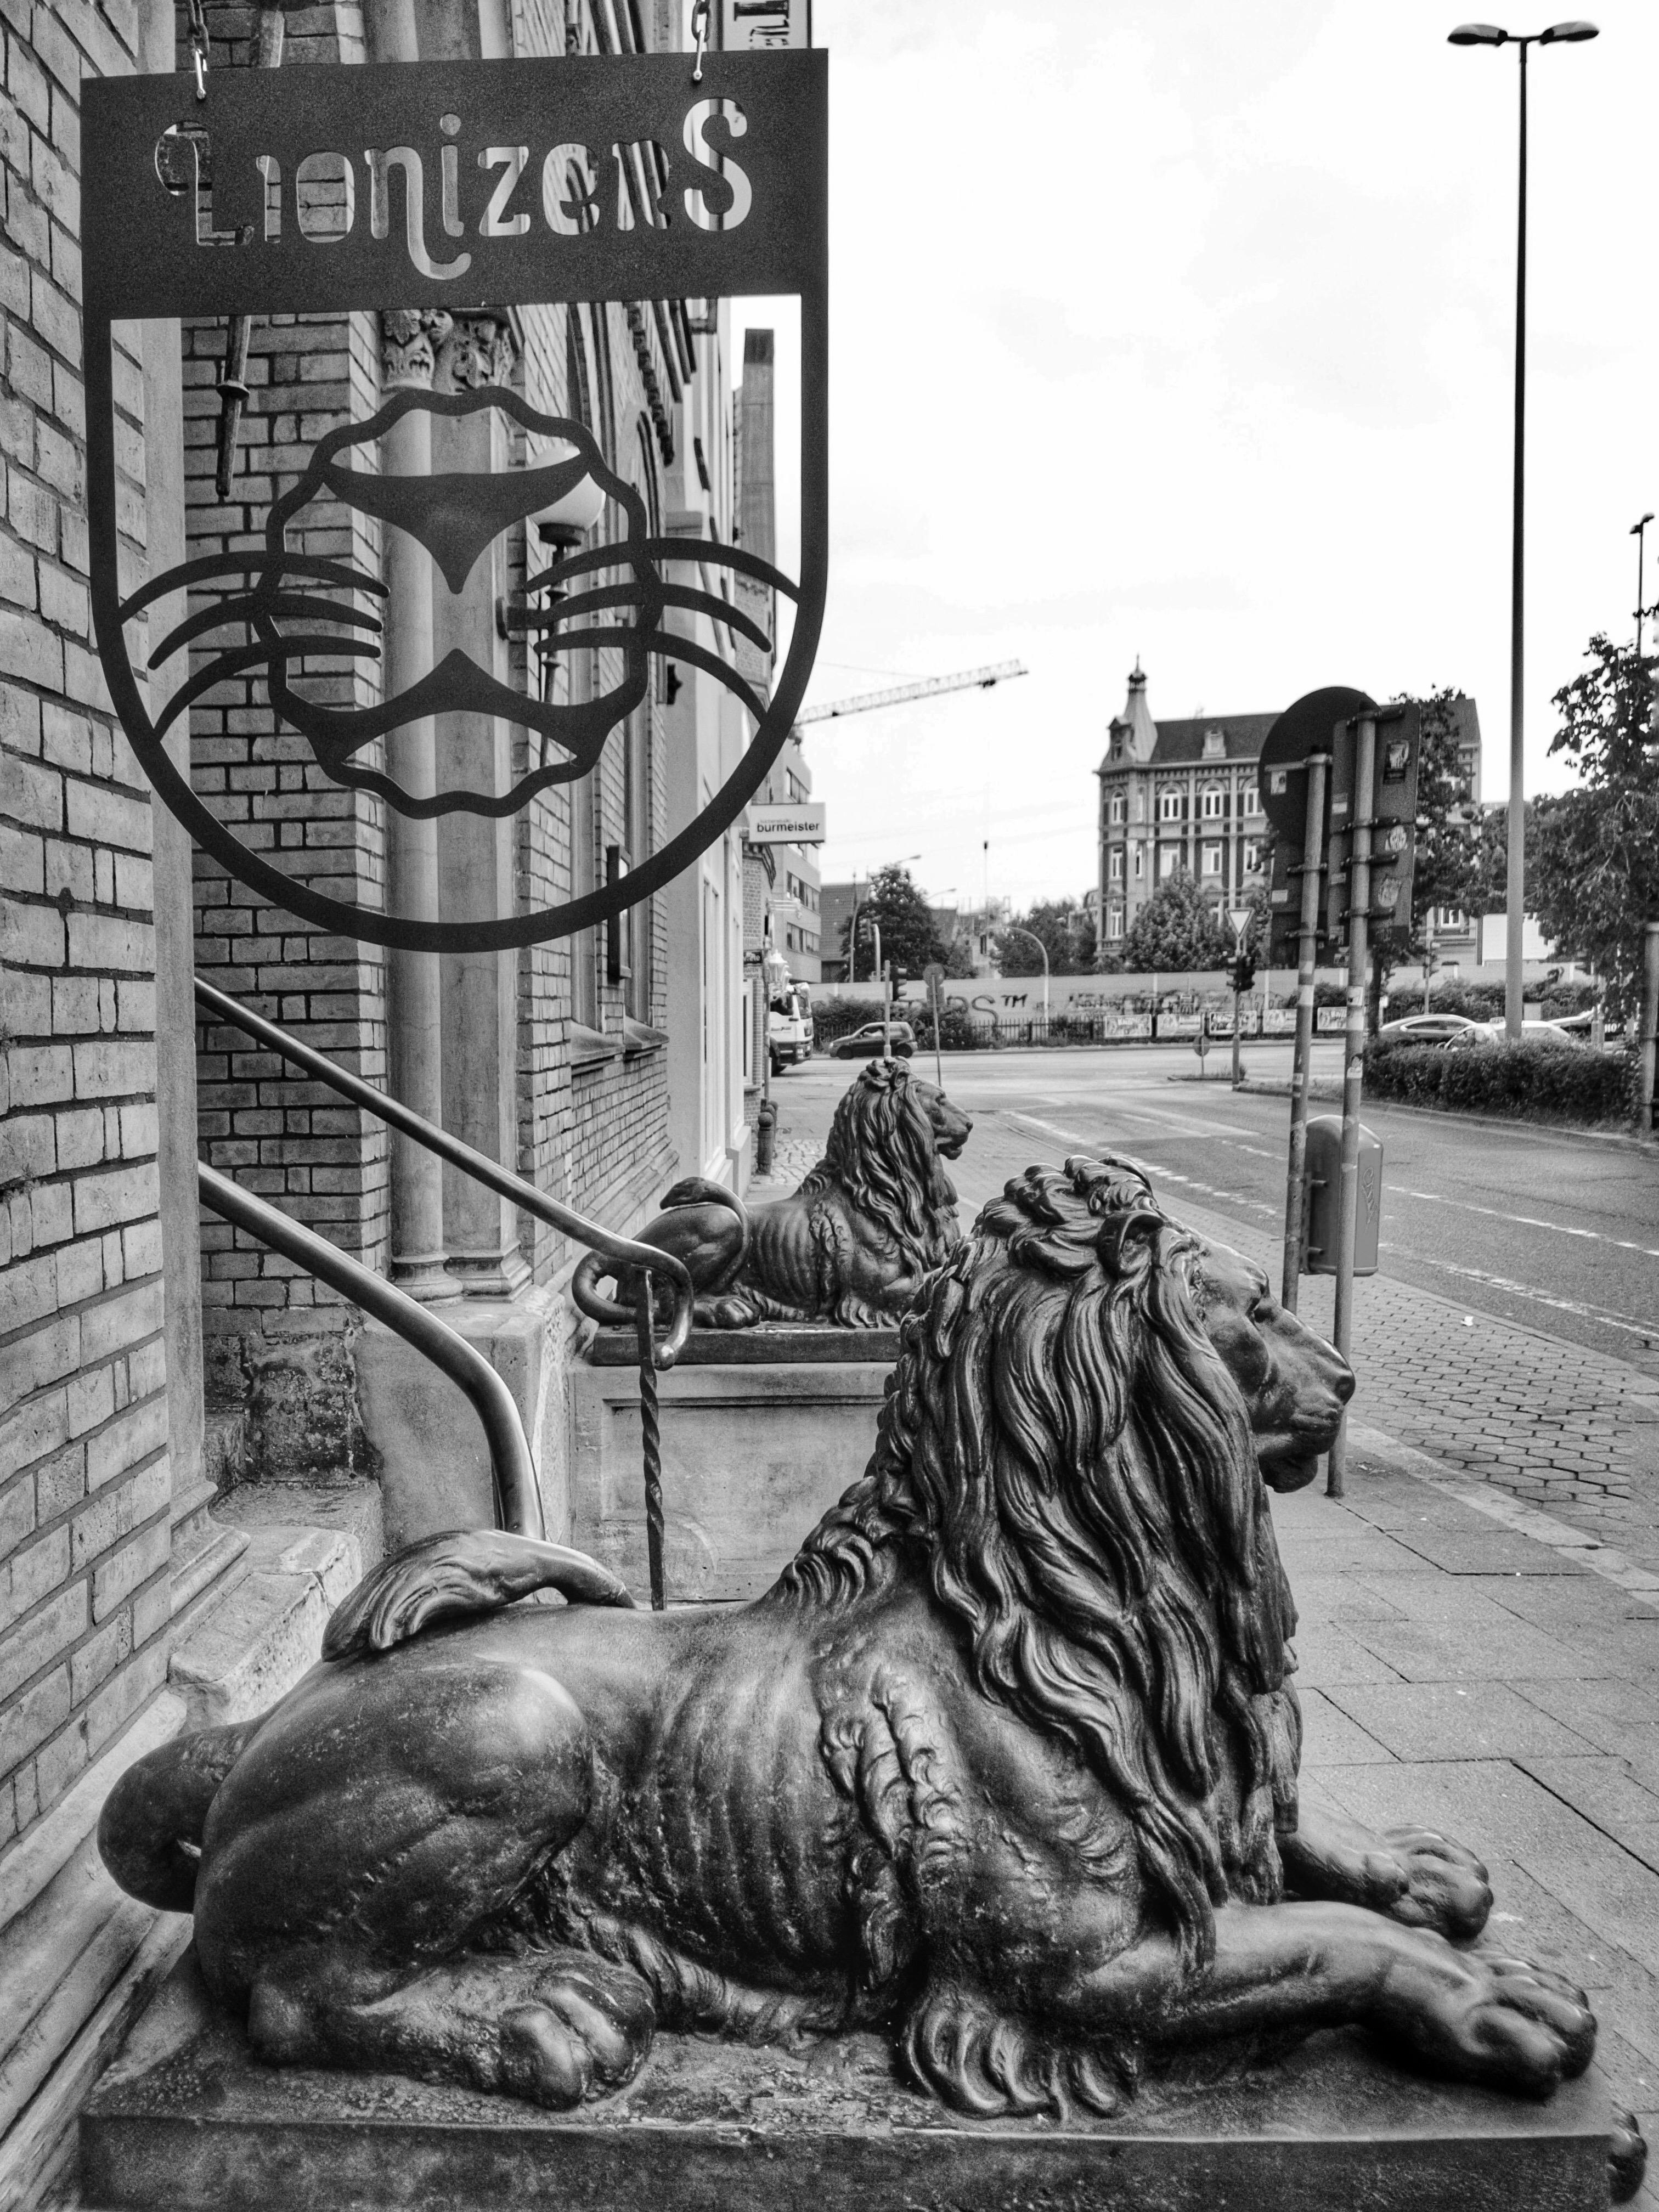 Lionizers Löwenportal in Harburg